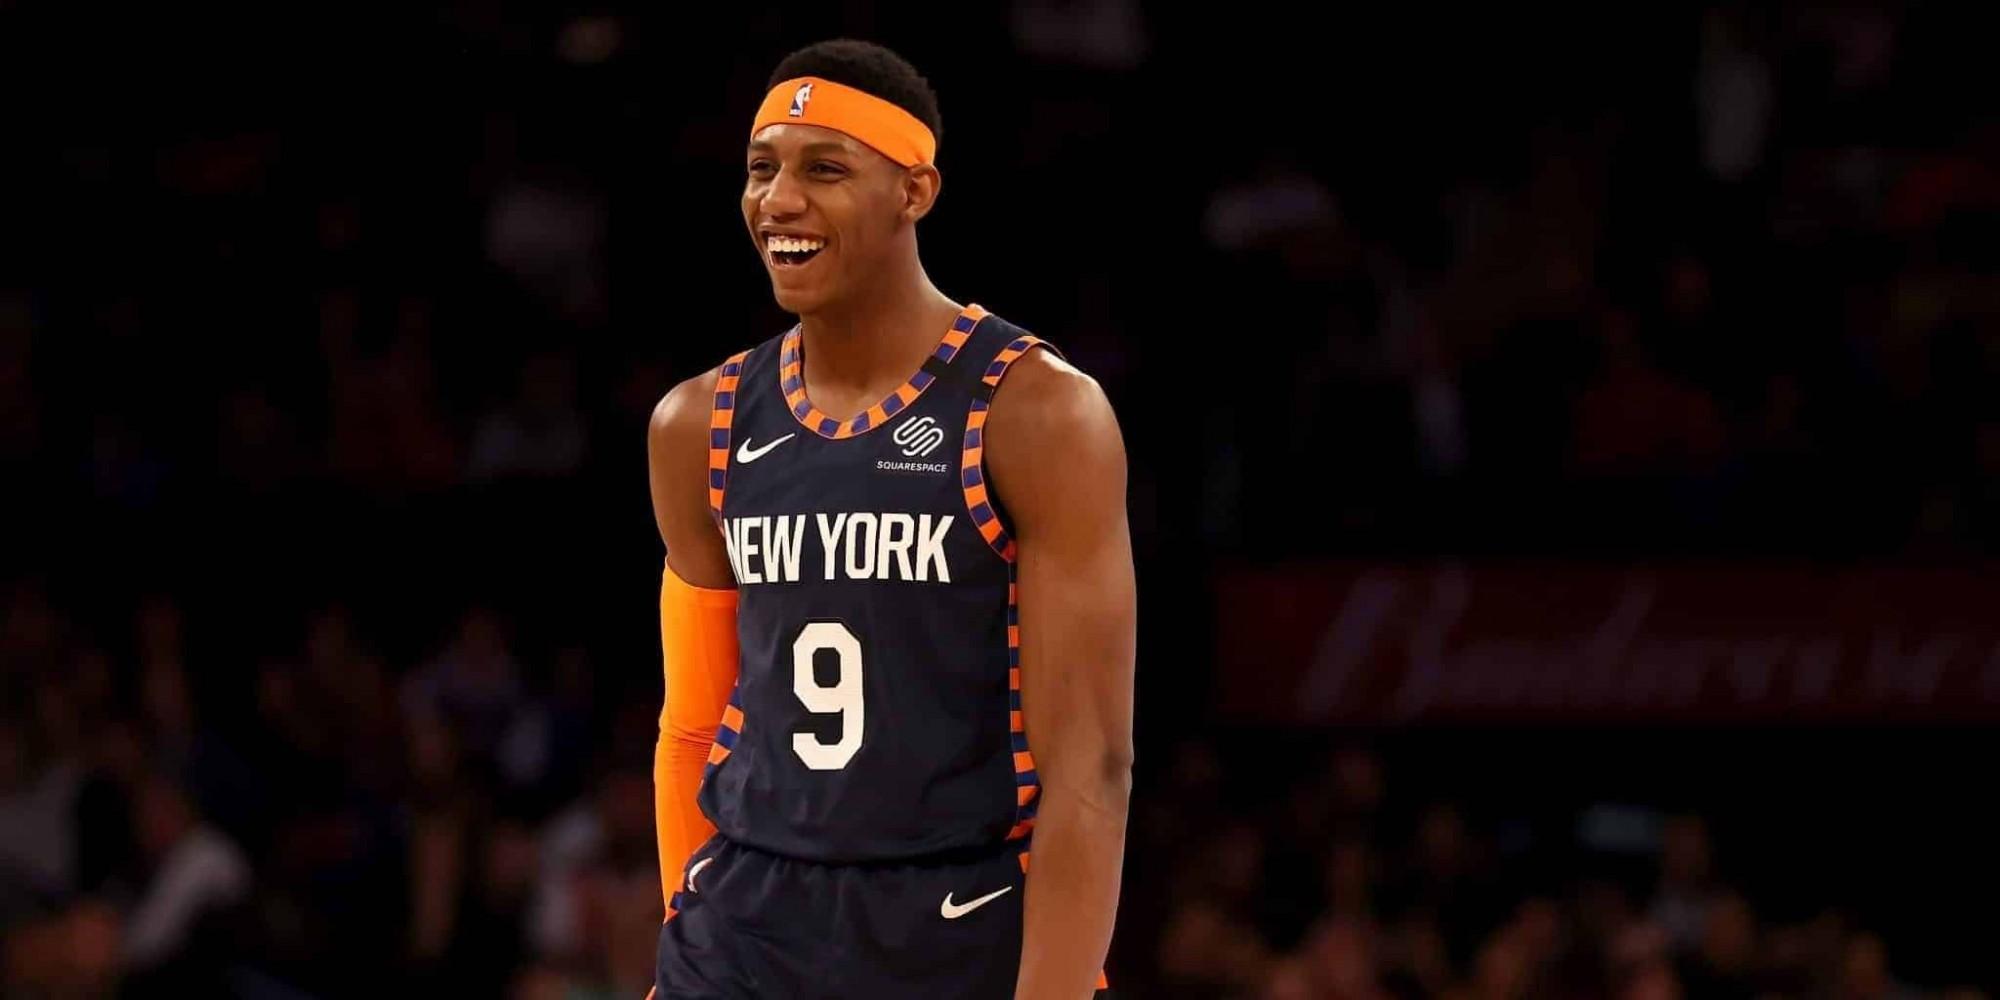 Podcast: Knicks' RJ Barrett's All-Rookie Case And More Draft Talk | The Knicks Wall